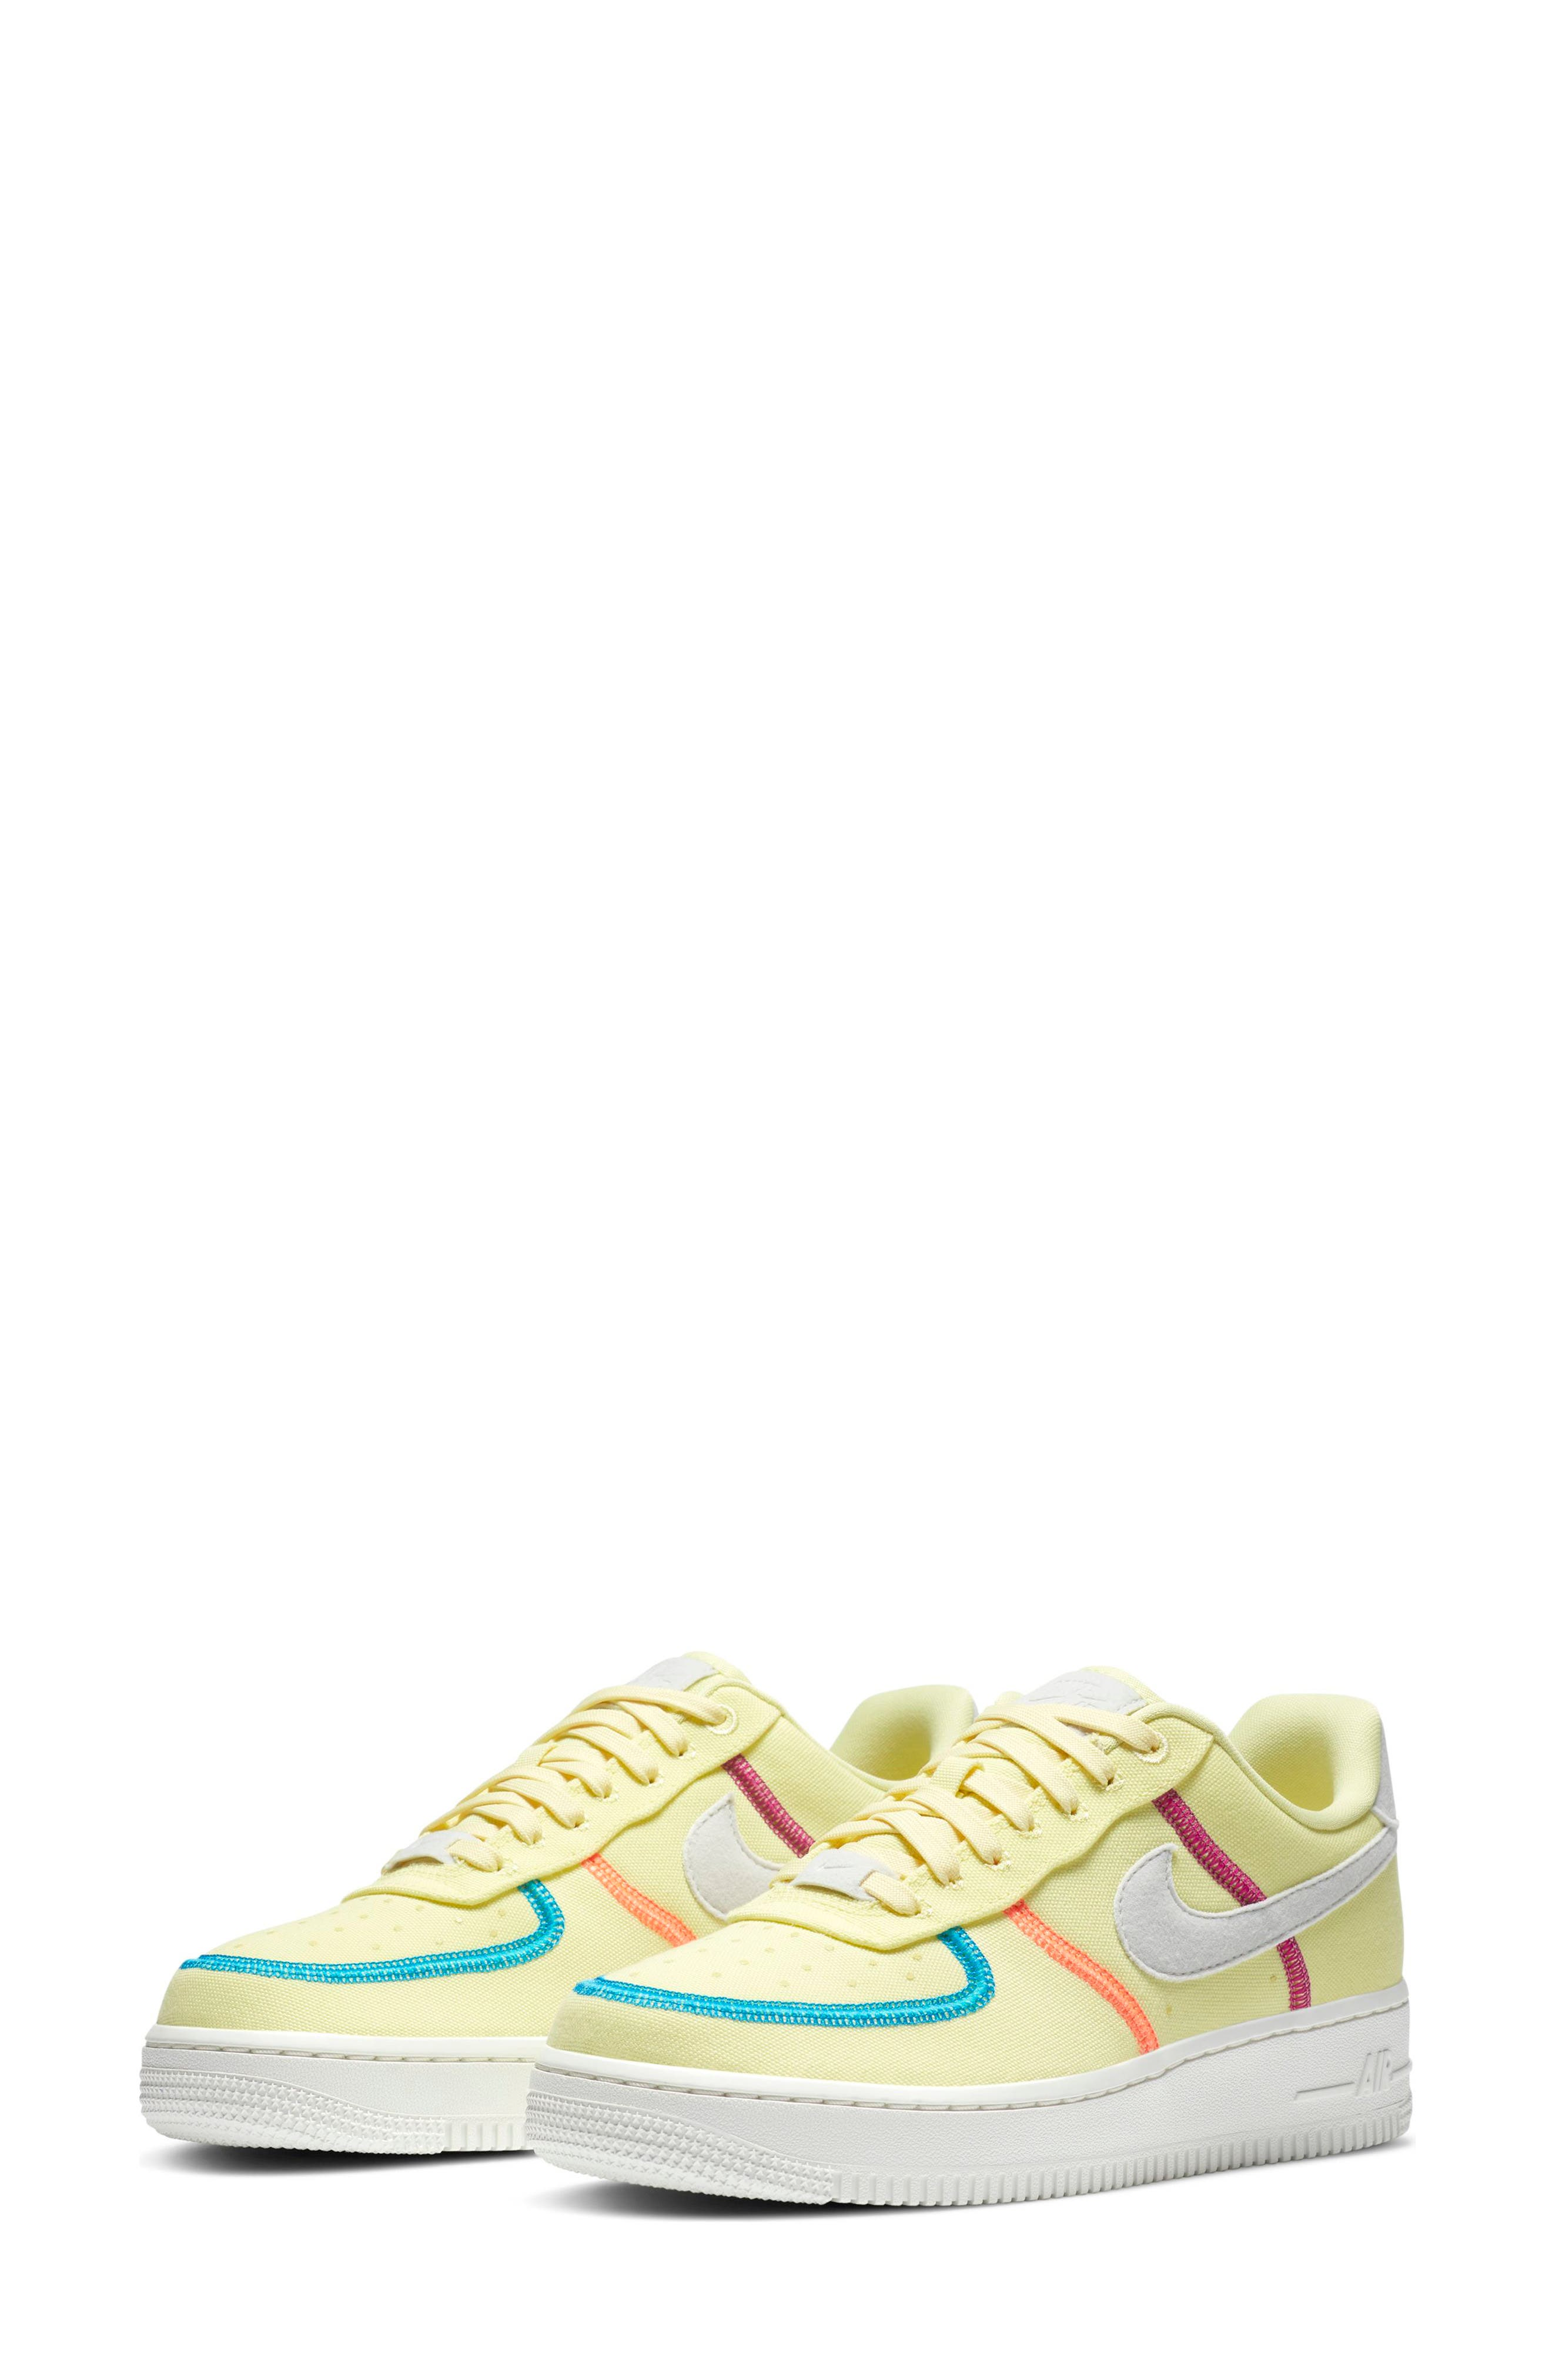 Women's Nike Air Force 1' 07 Lx Sneaker